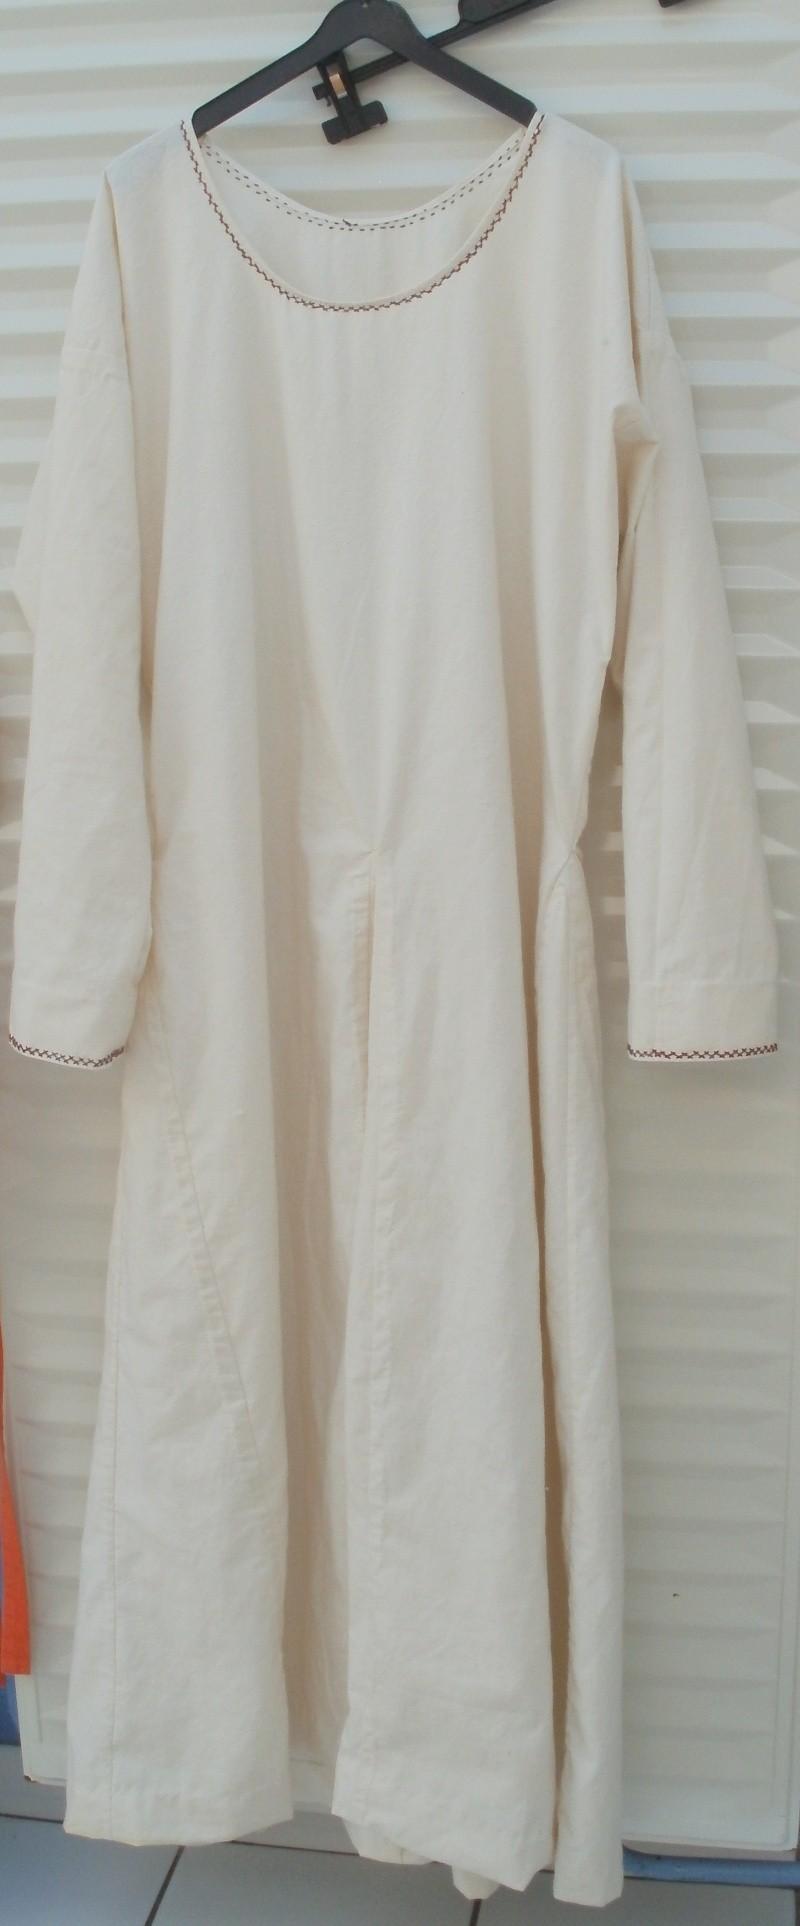 chainse ou chemise vite faite P5280010